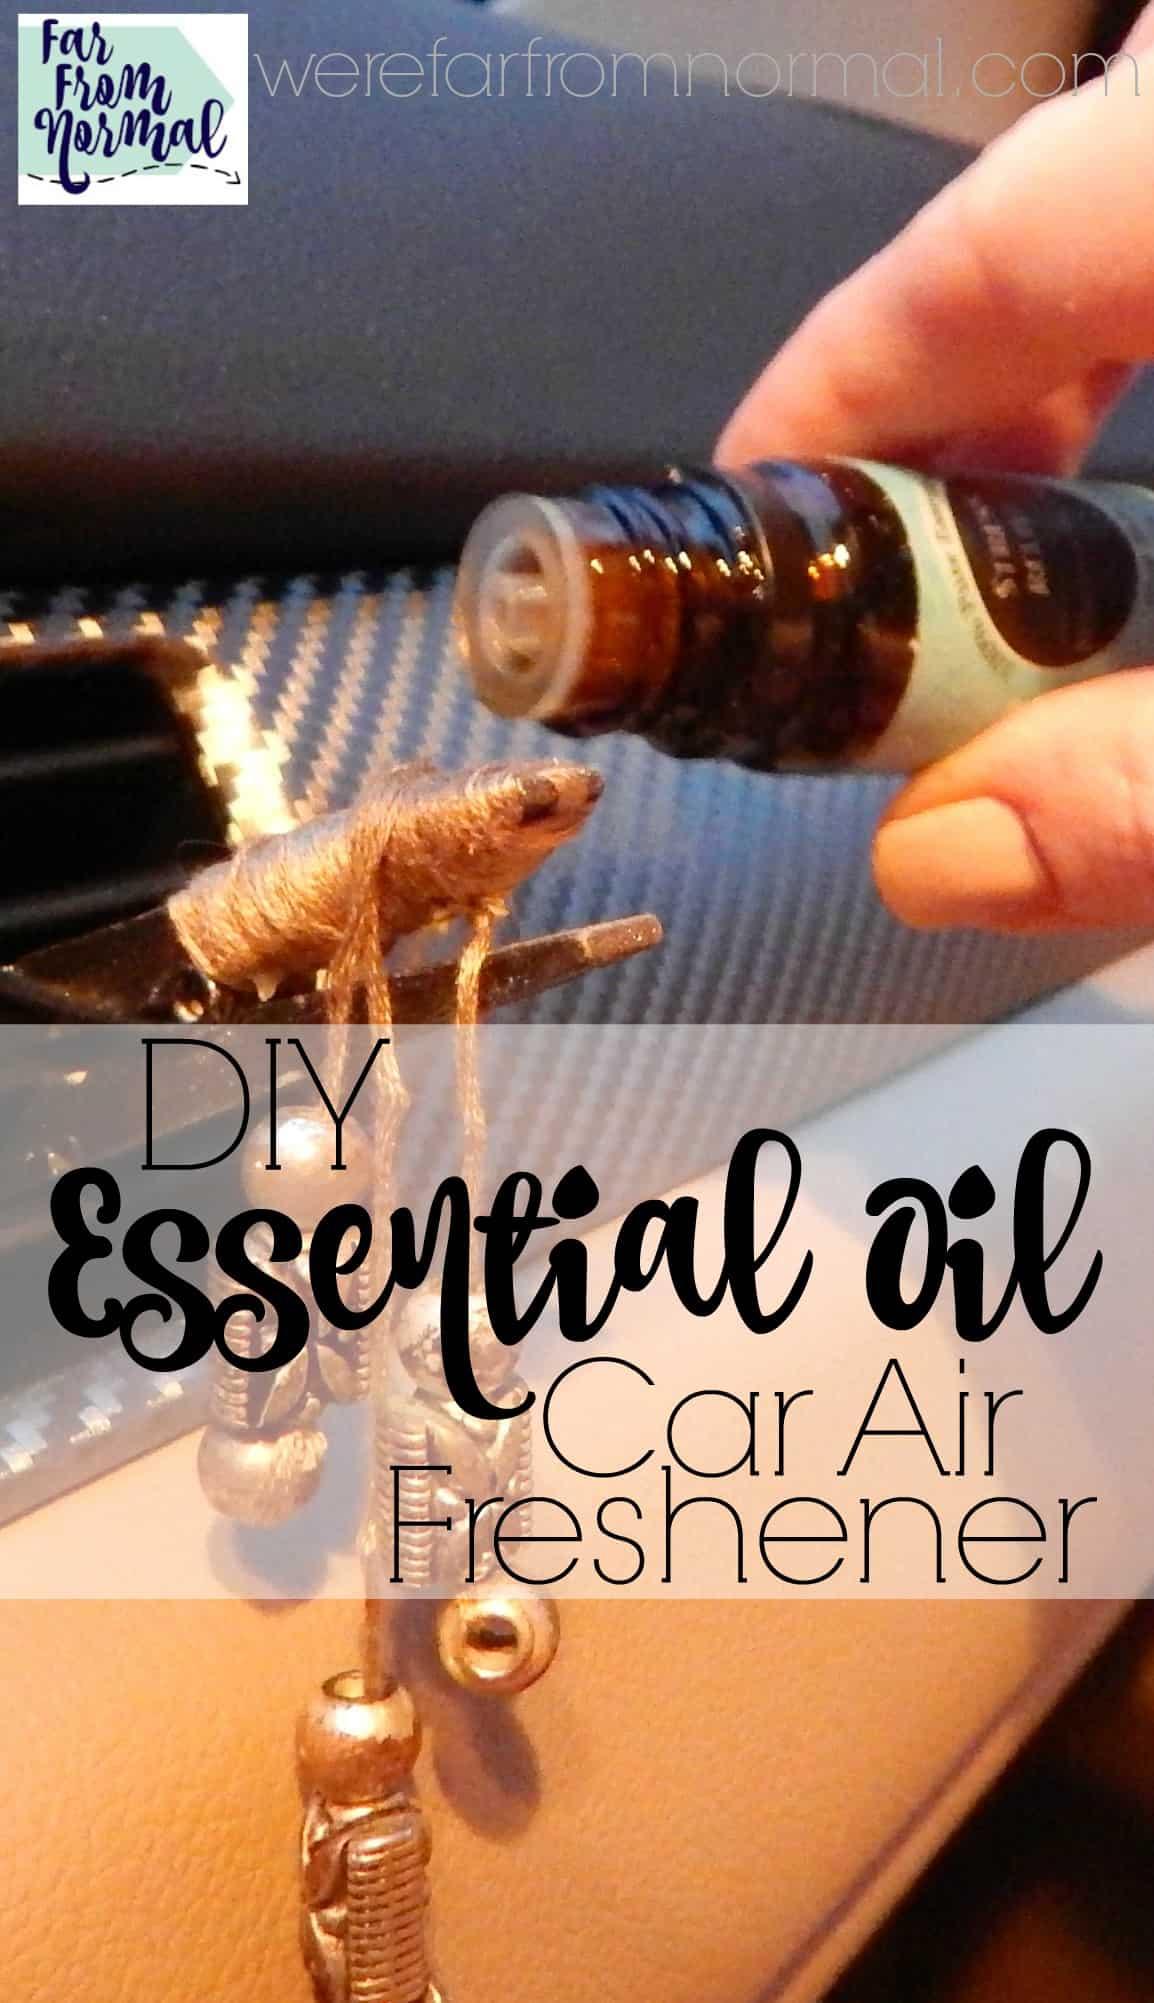 Diy Essential Oil Car Air Freshener